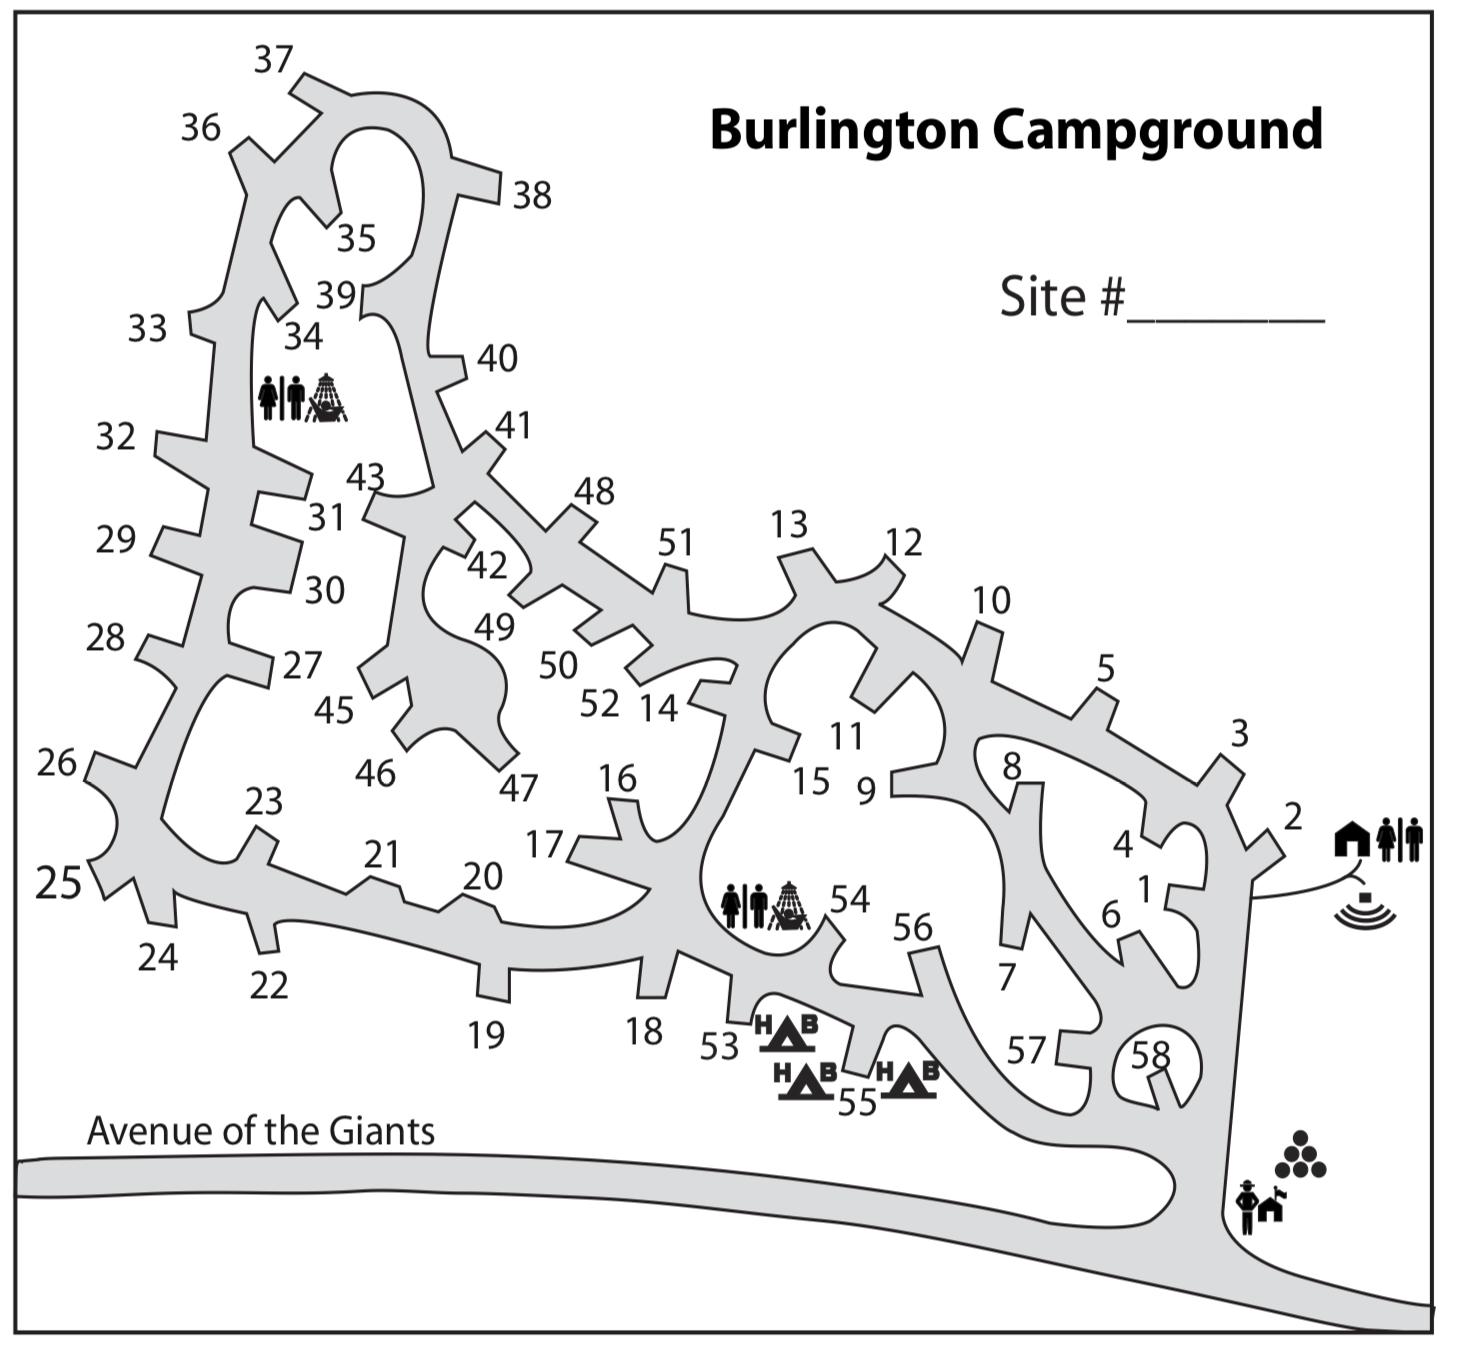 Burlington Campsite Photos and Camping Information